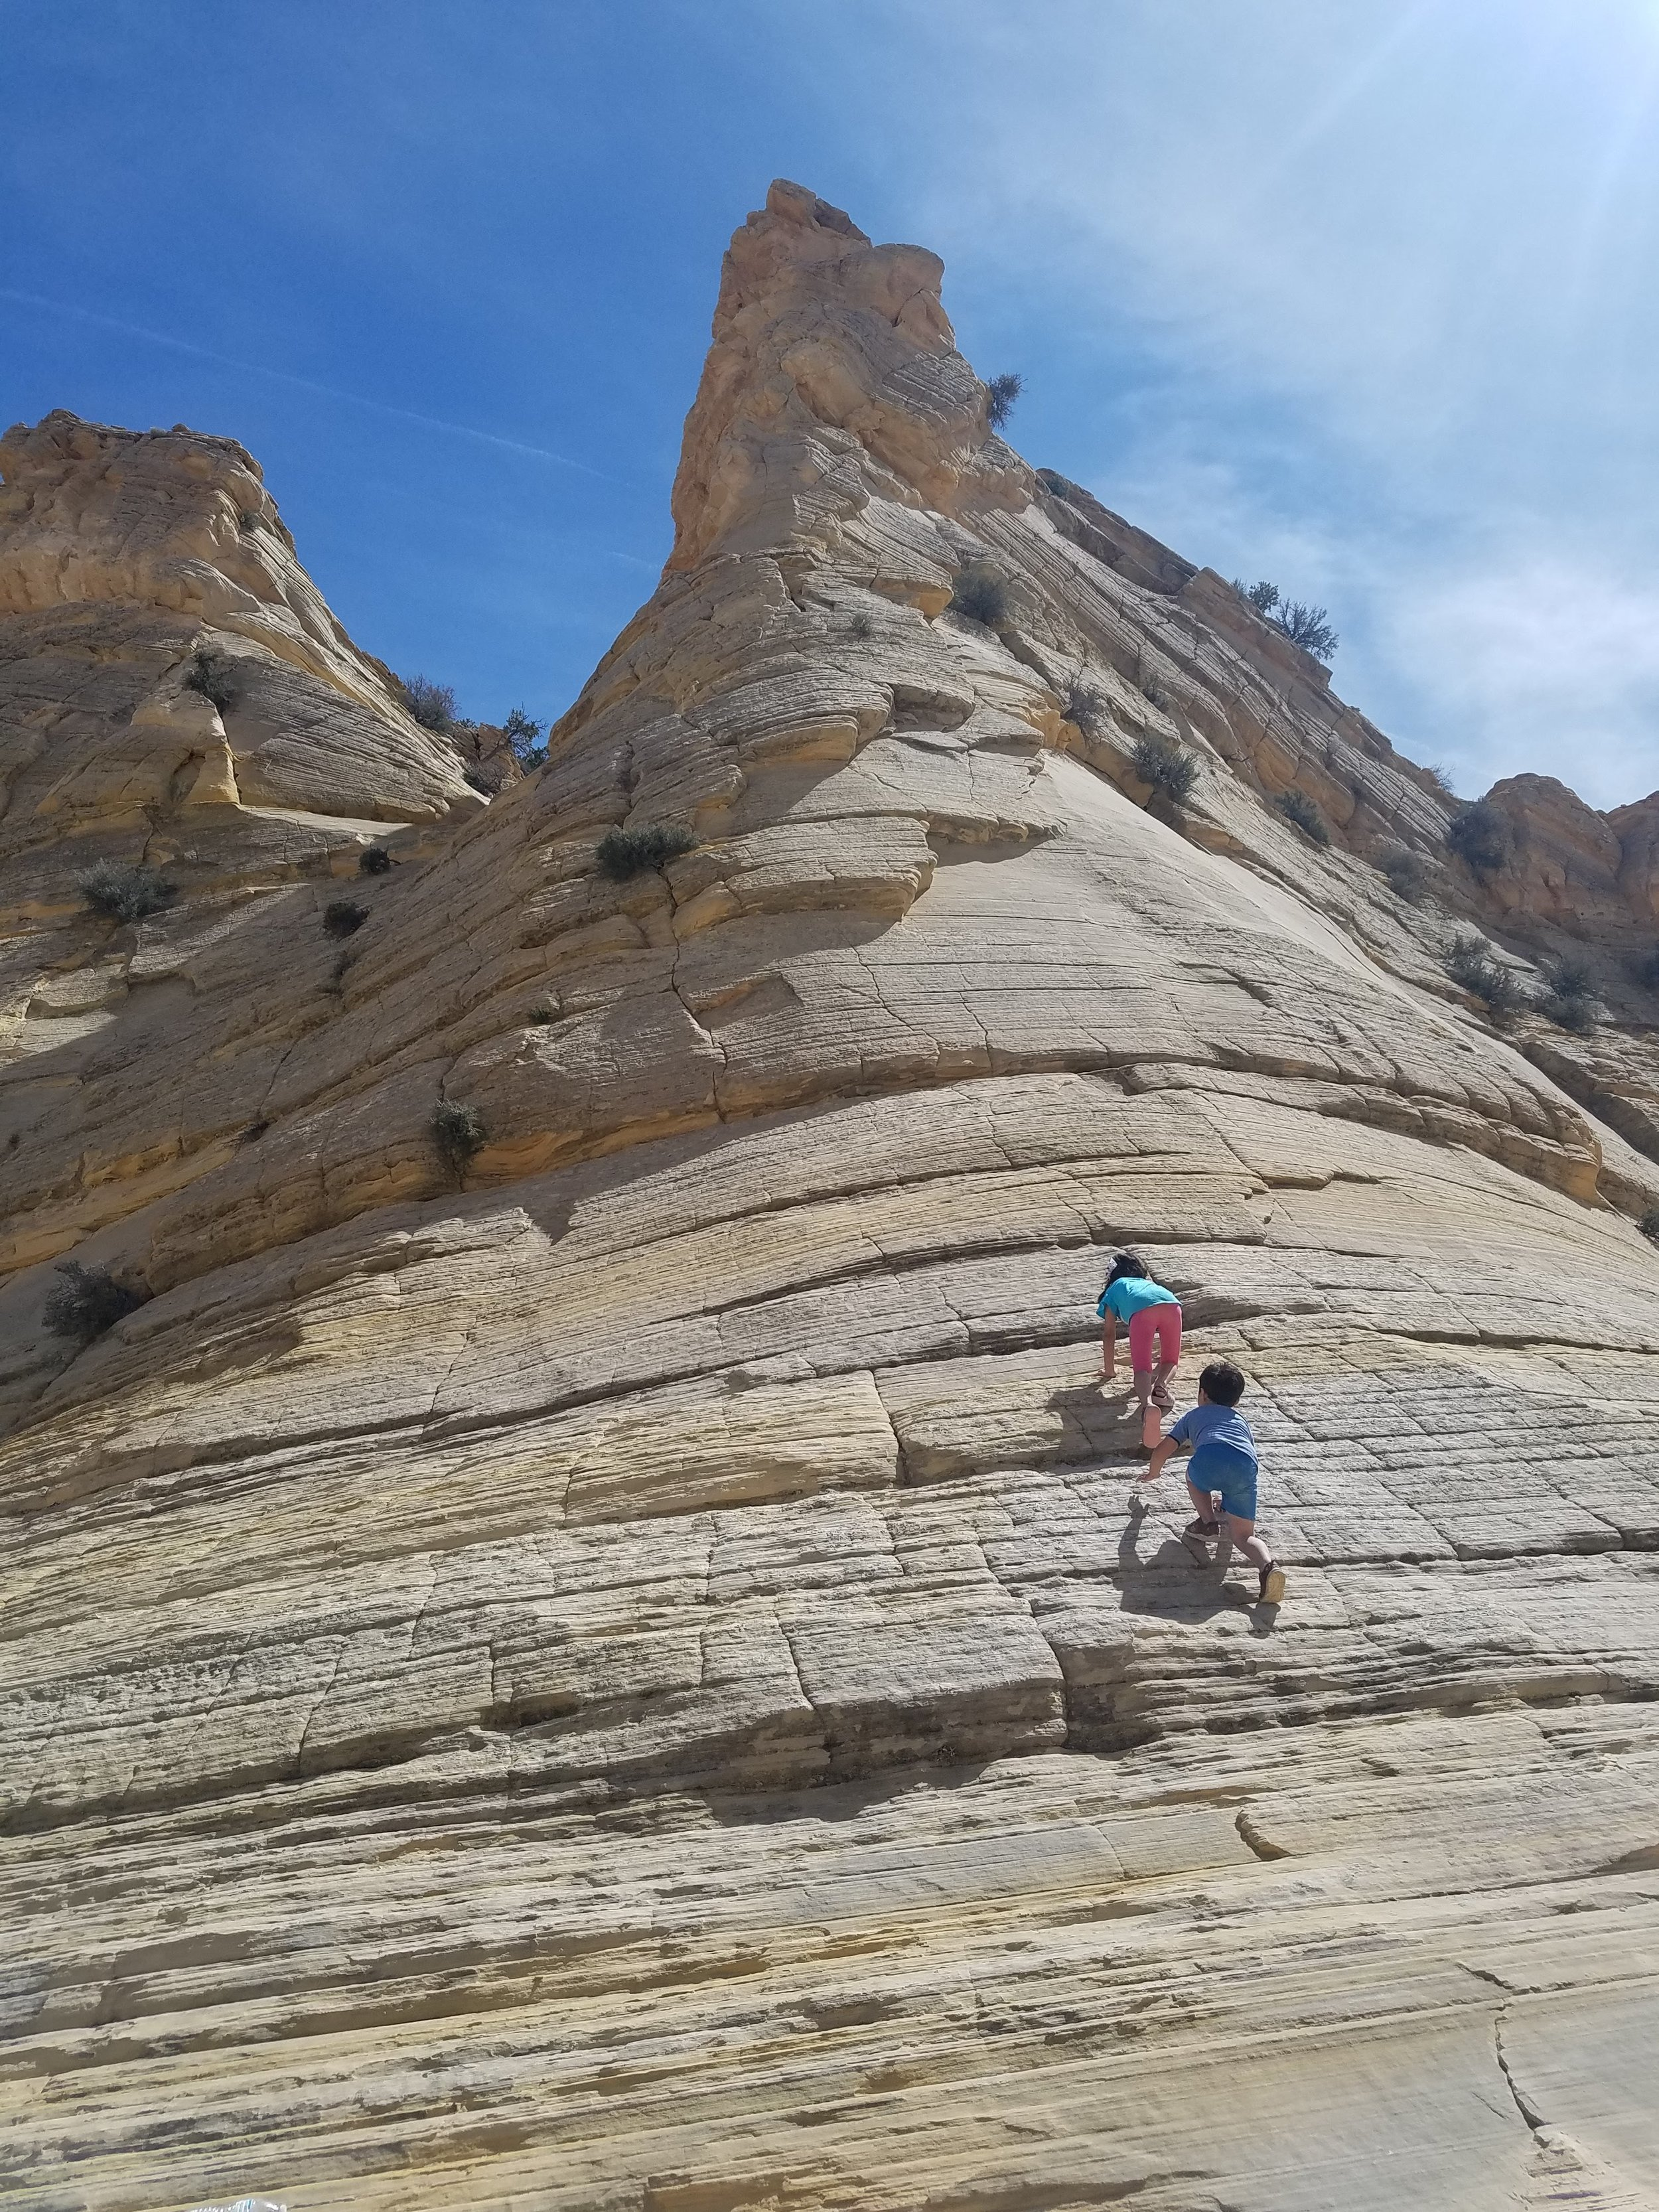 Climbing sandstone